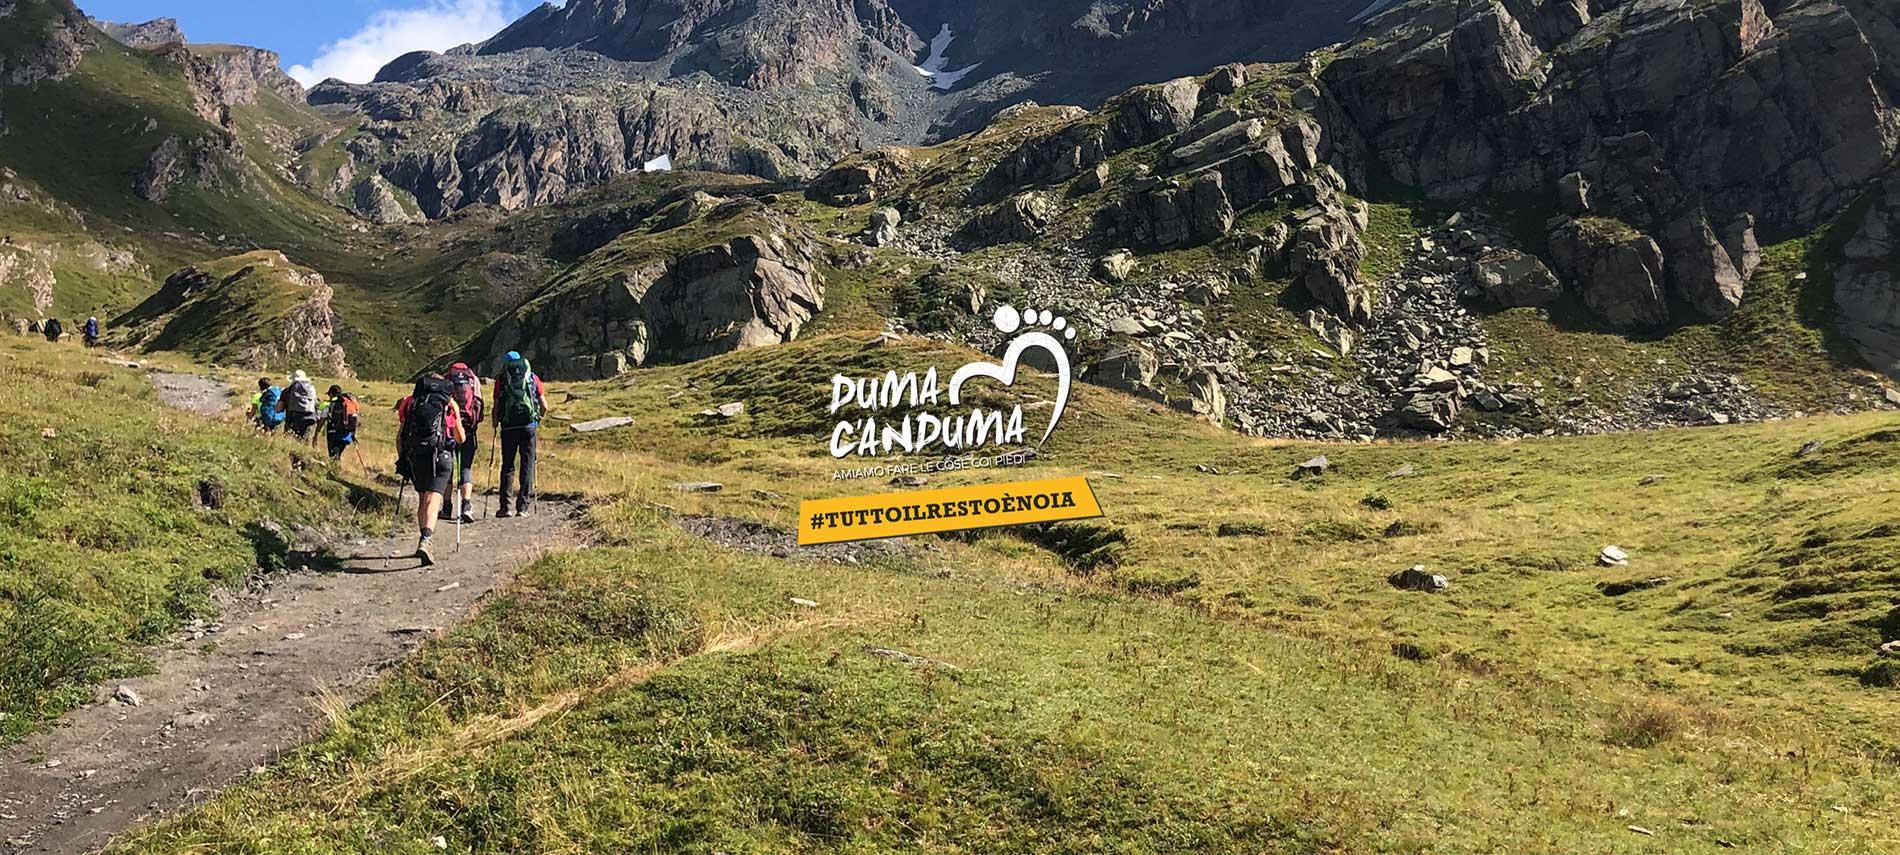 DUMA C'ANDUMA - Trekking e Viaggi a Piedi